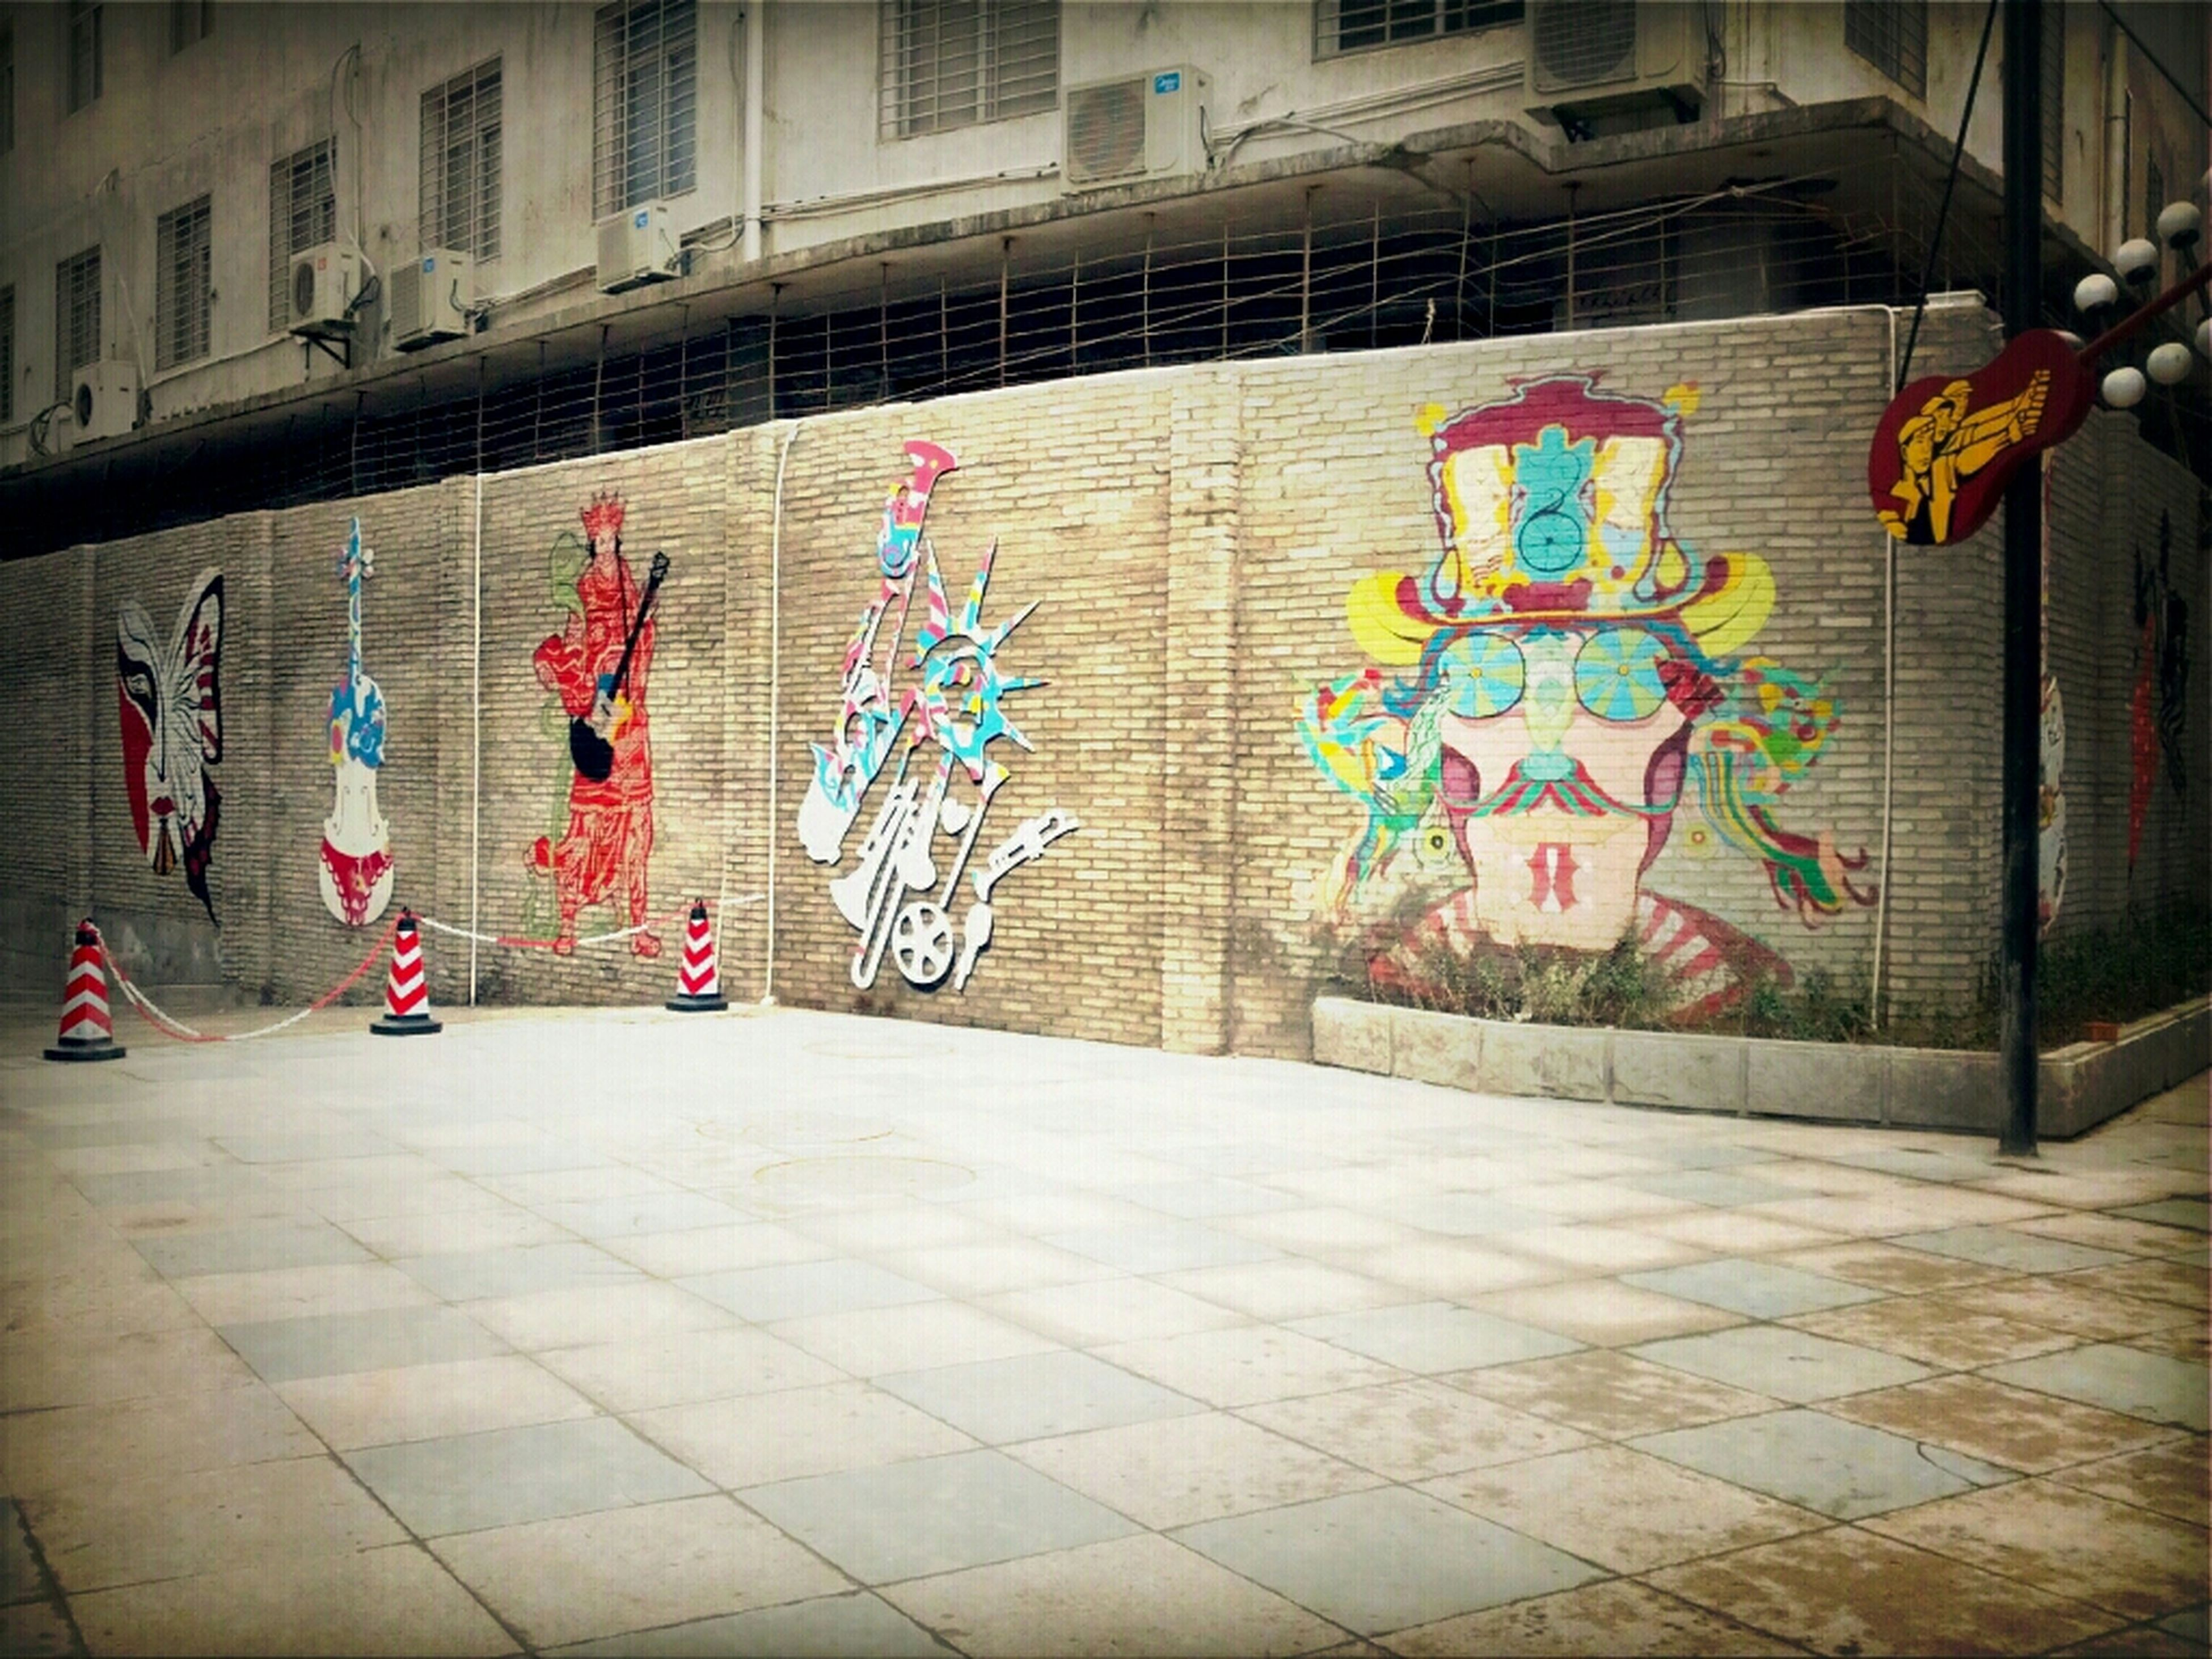 art, art and craft, creativity, graffiti, built structure, architecture, wall - building feature, text, multi colored, building exterior, western script, tiled floor, sidewalk, design, human representation, decoration, pattern, cobblestone, street art, flooring